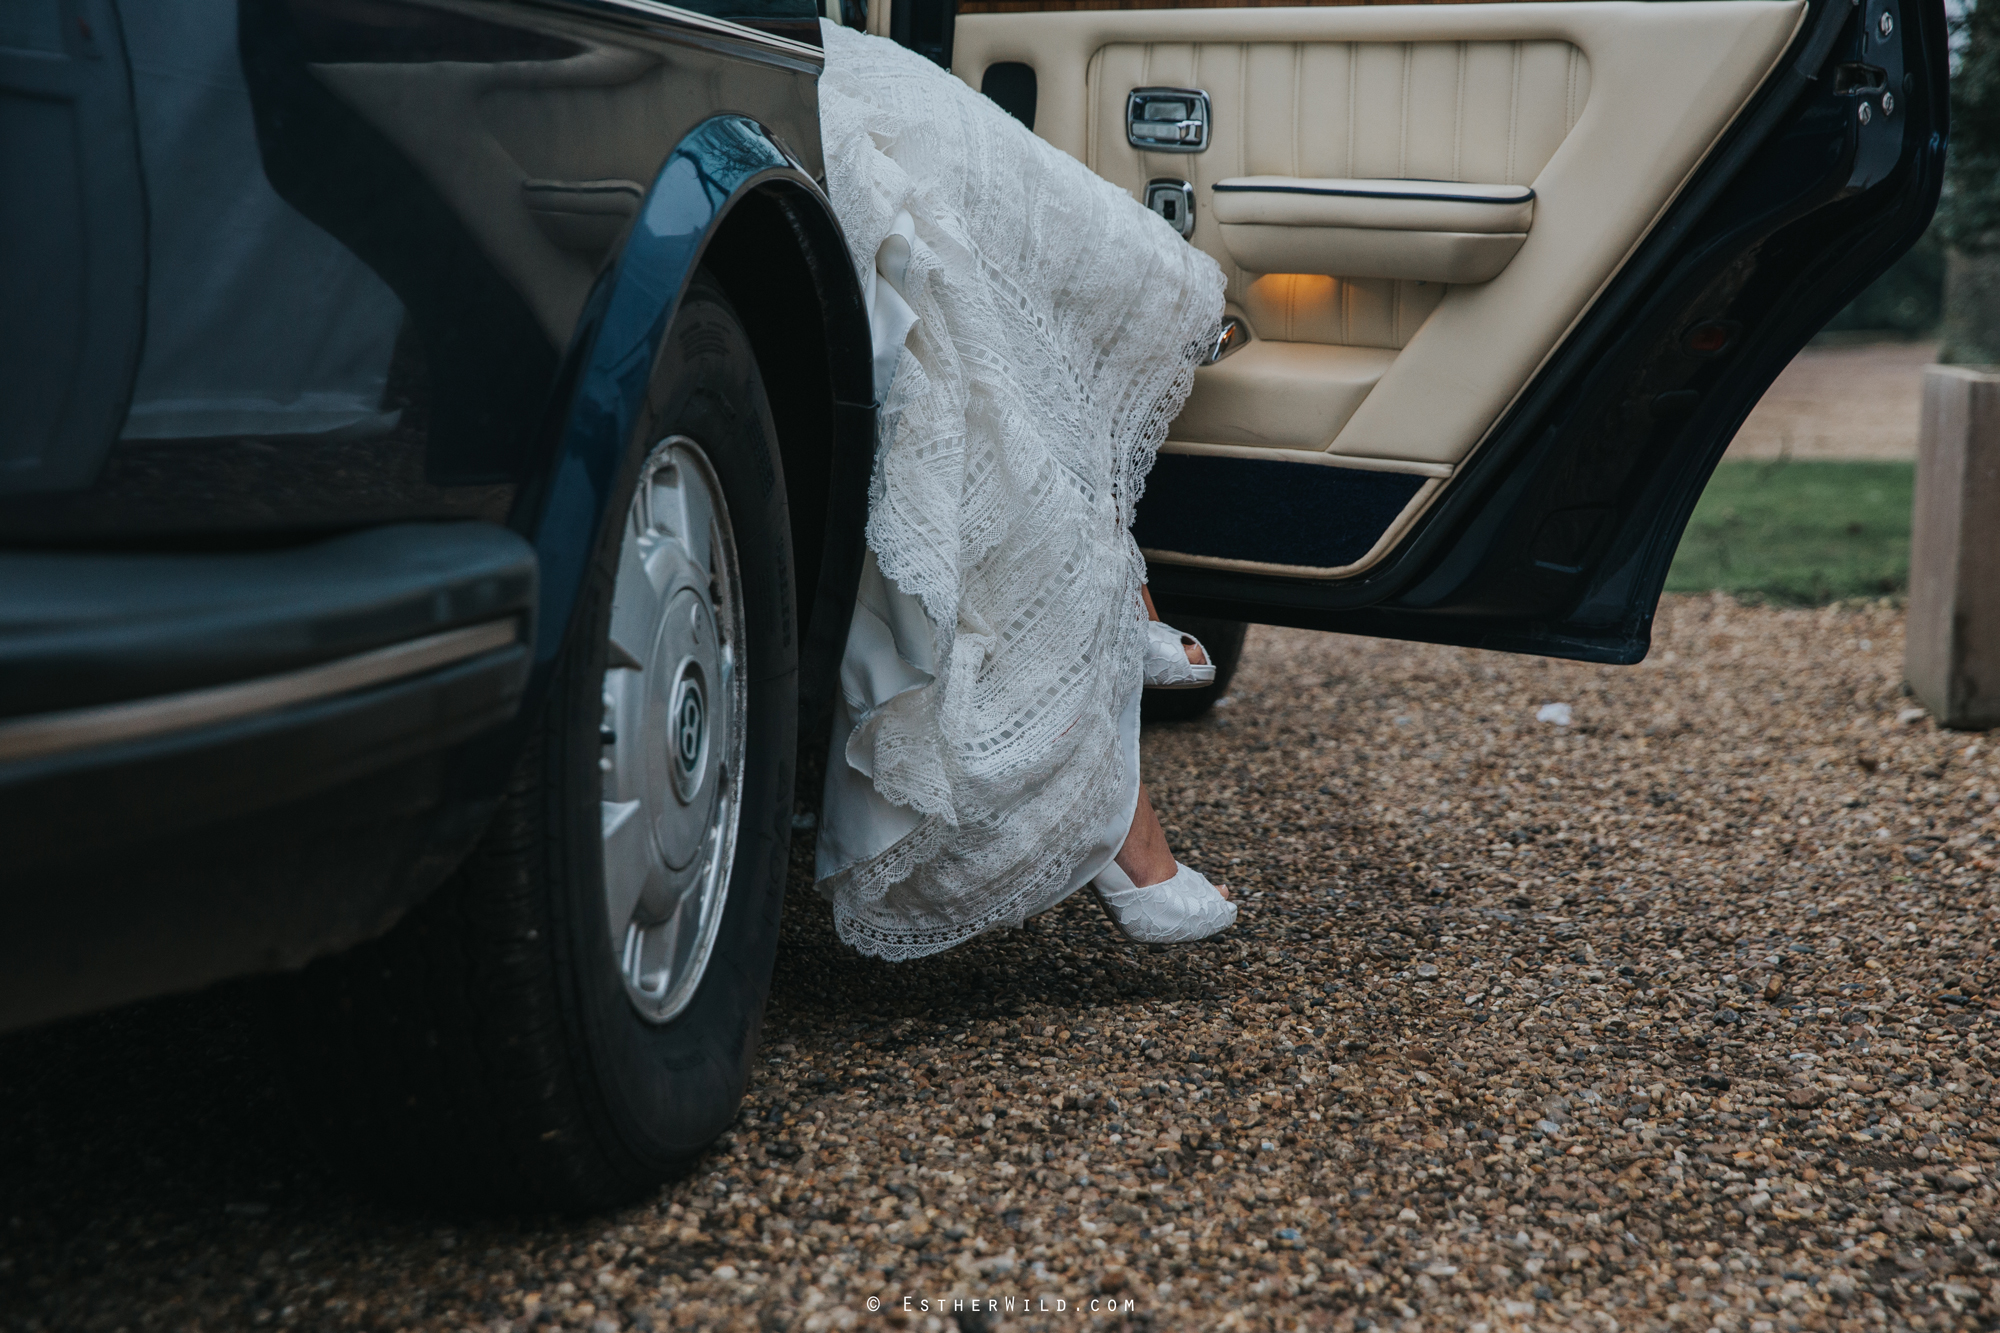 Elms_Barn_Weddings_Suffolk_Photographer_Copyright_Esther_Wild_IMG_1020.jpg